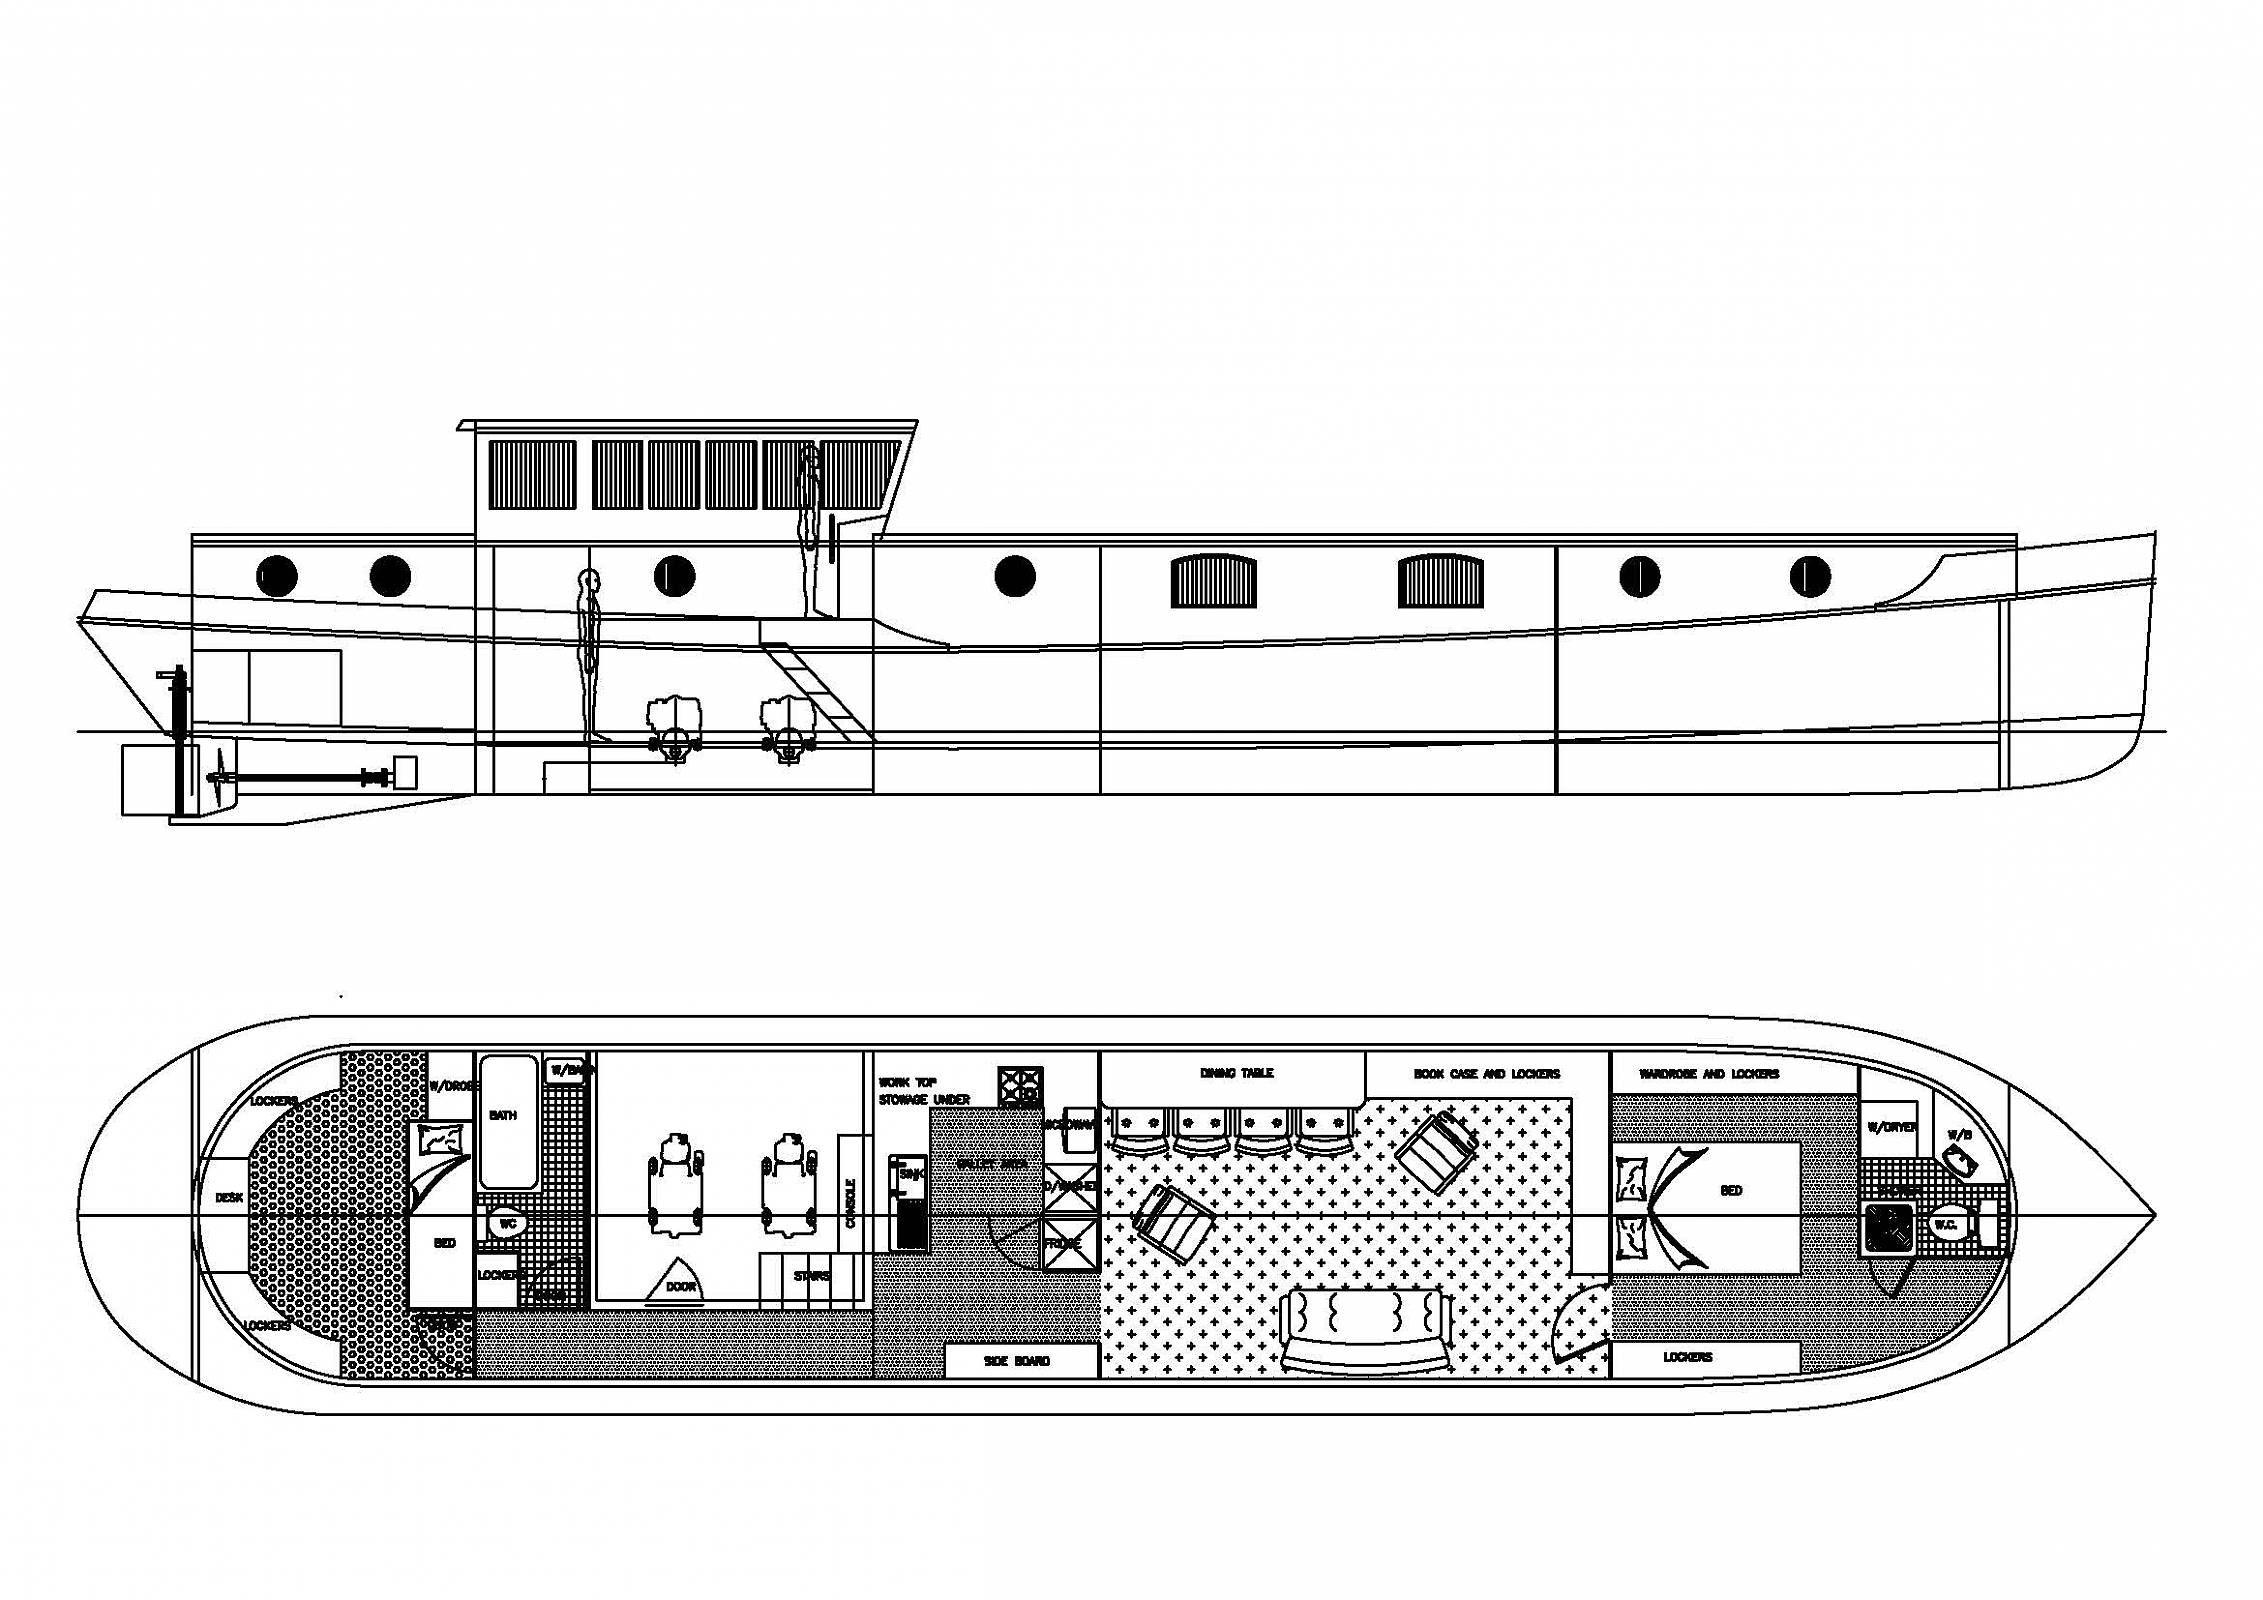 House barge plans escortsea for Boat floor plans